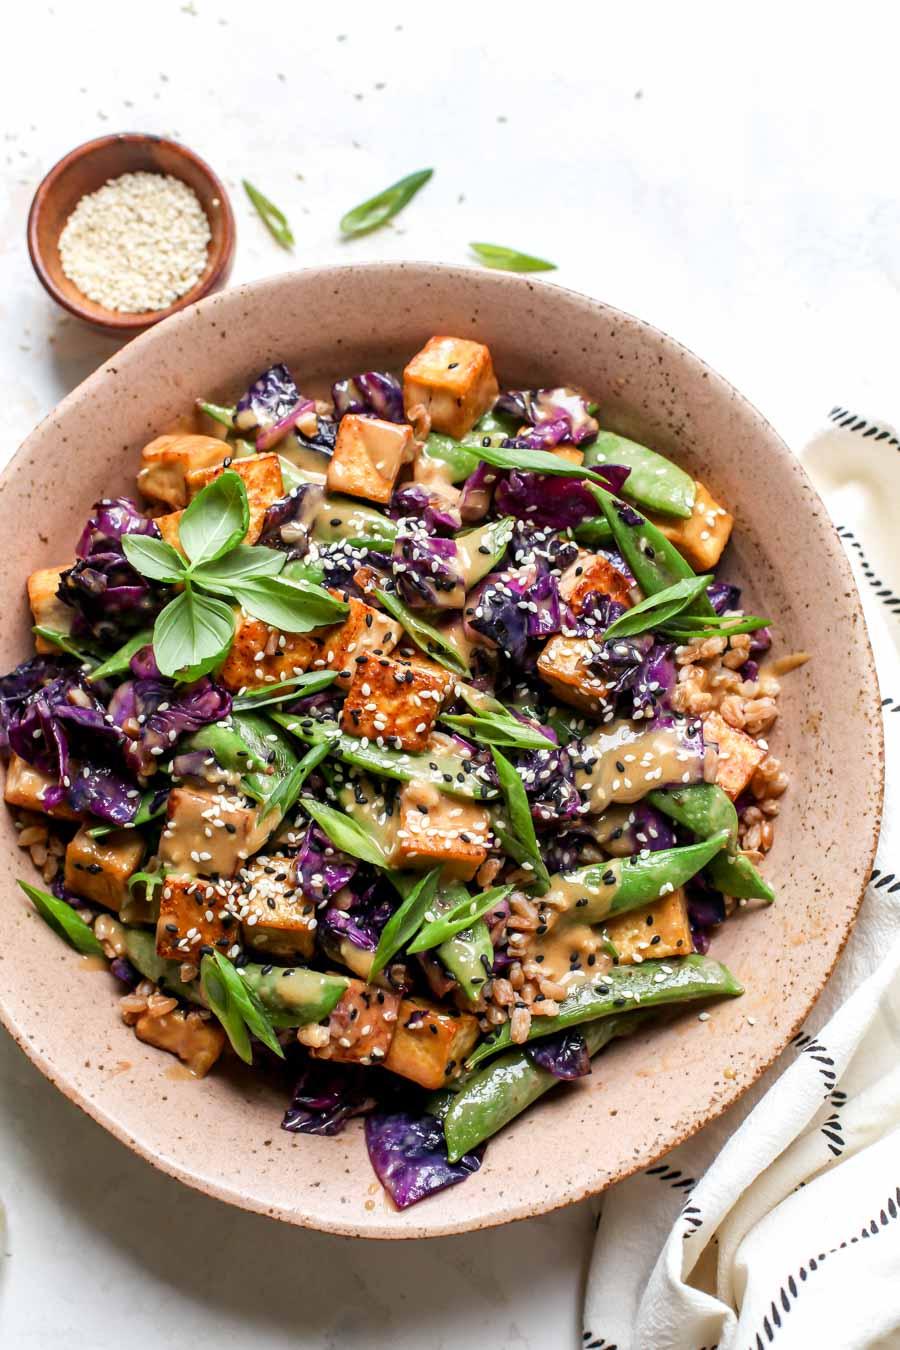 Crispy Tofu with Rice and Veggies